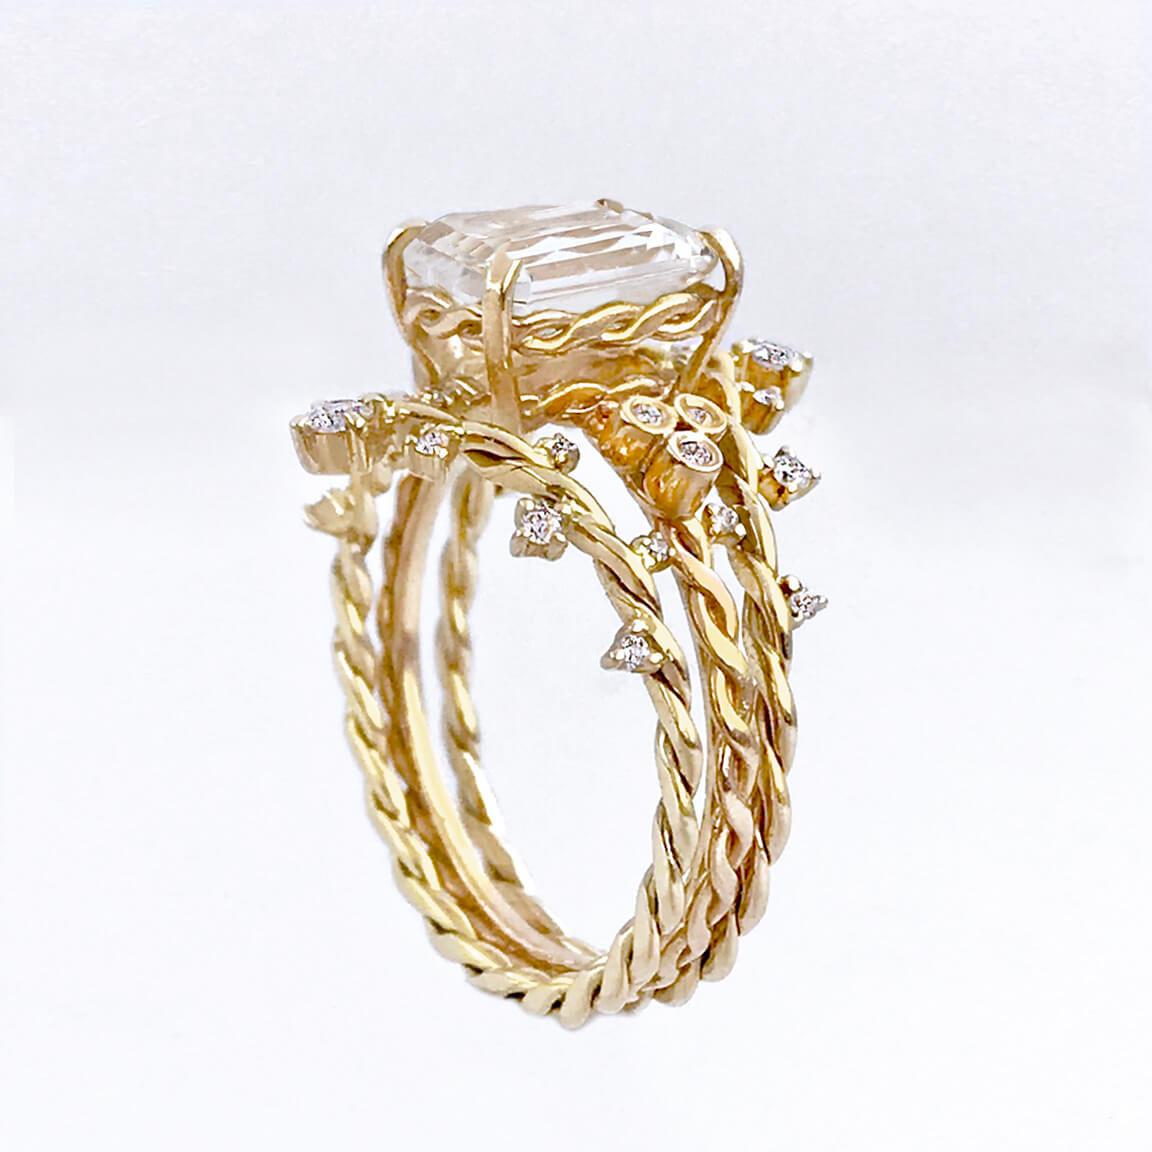 emerald-cut-qurtz-diamond-solitaire-twiat-stacking-set-14k-18k-M-jewelyrie